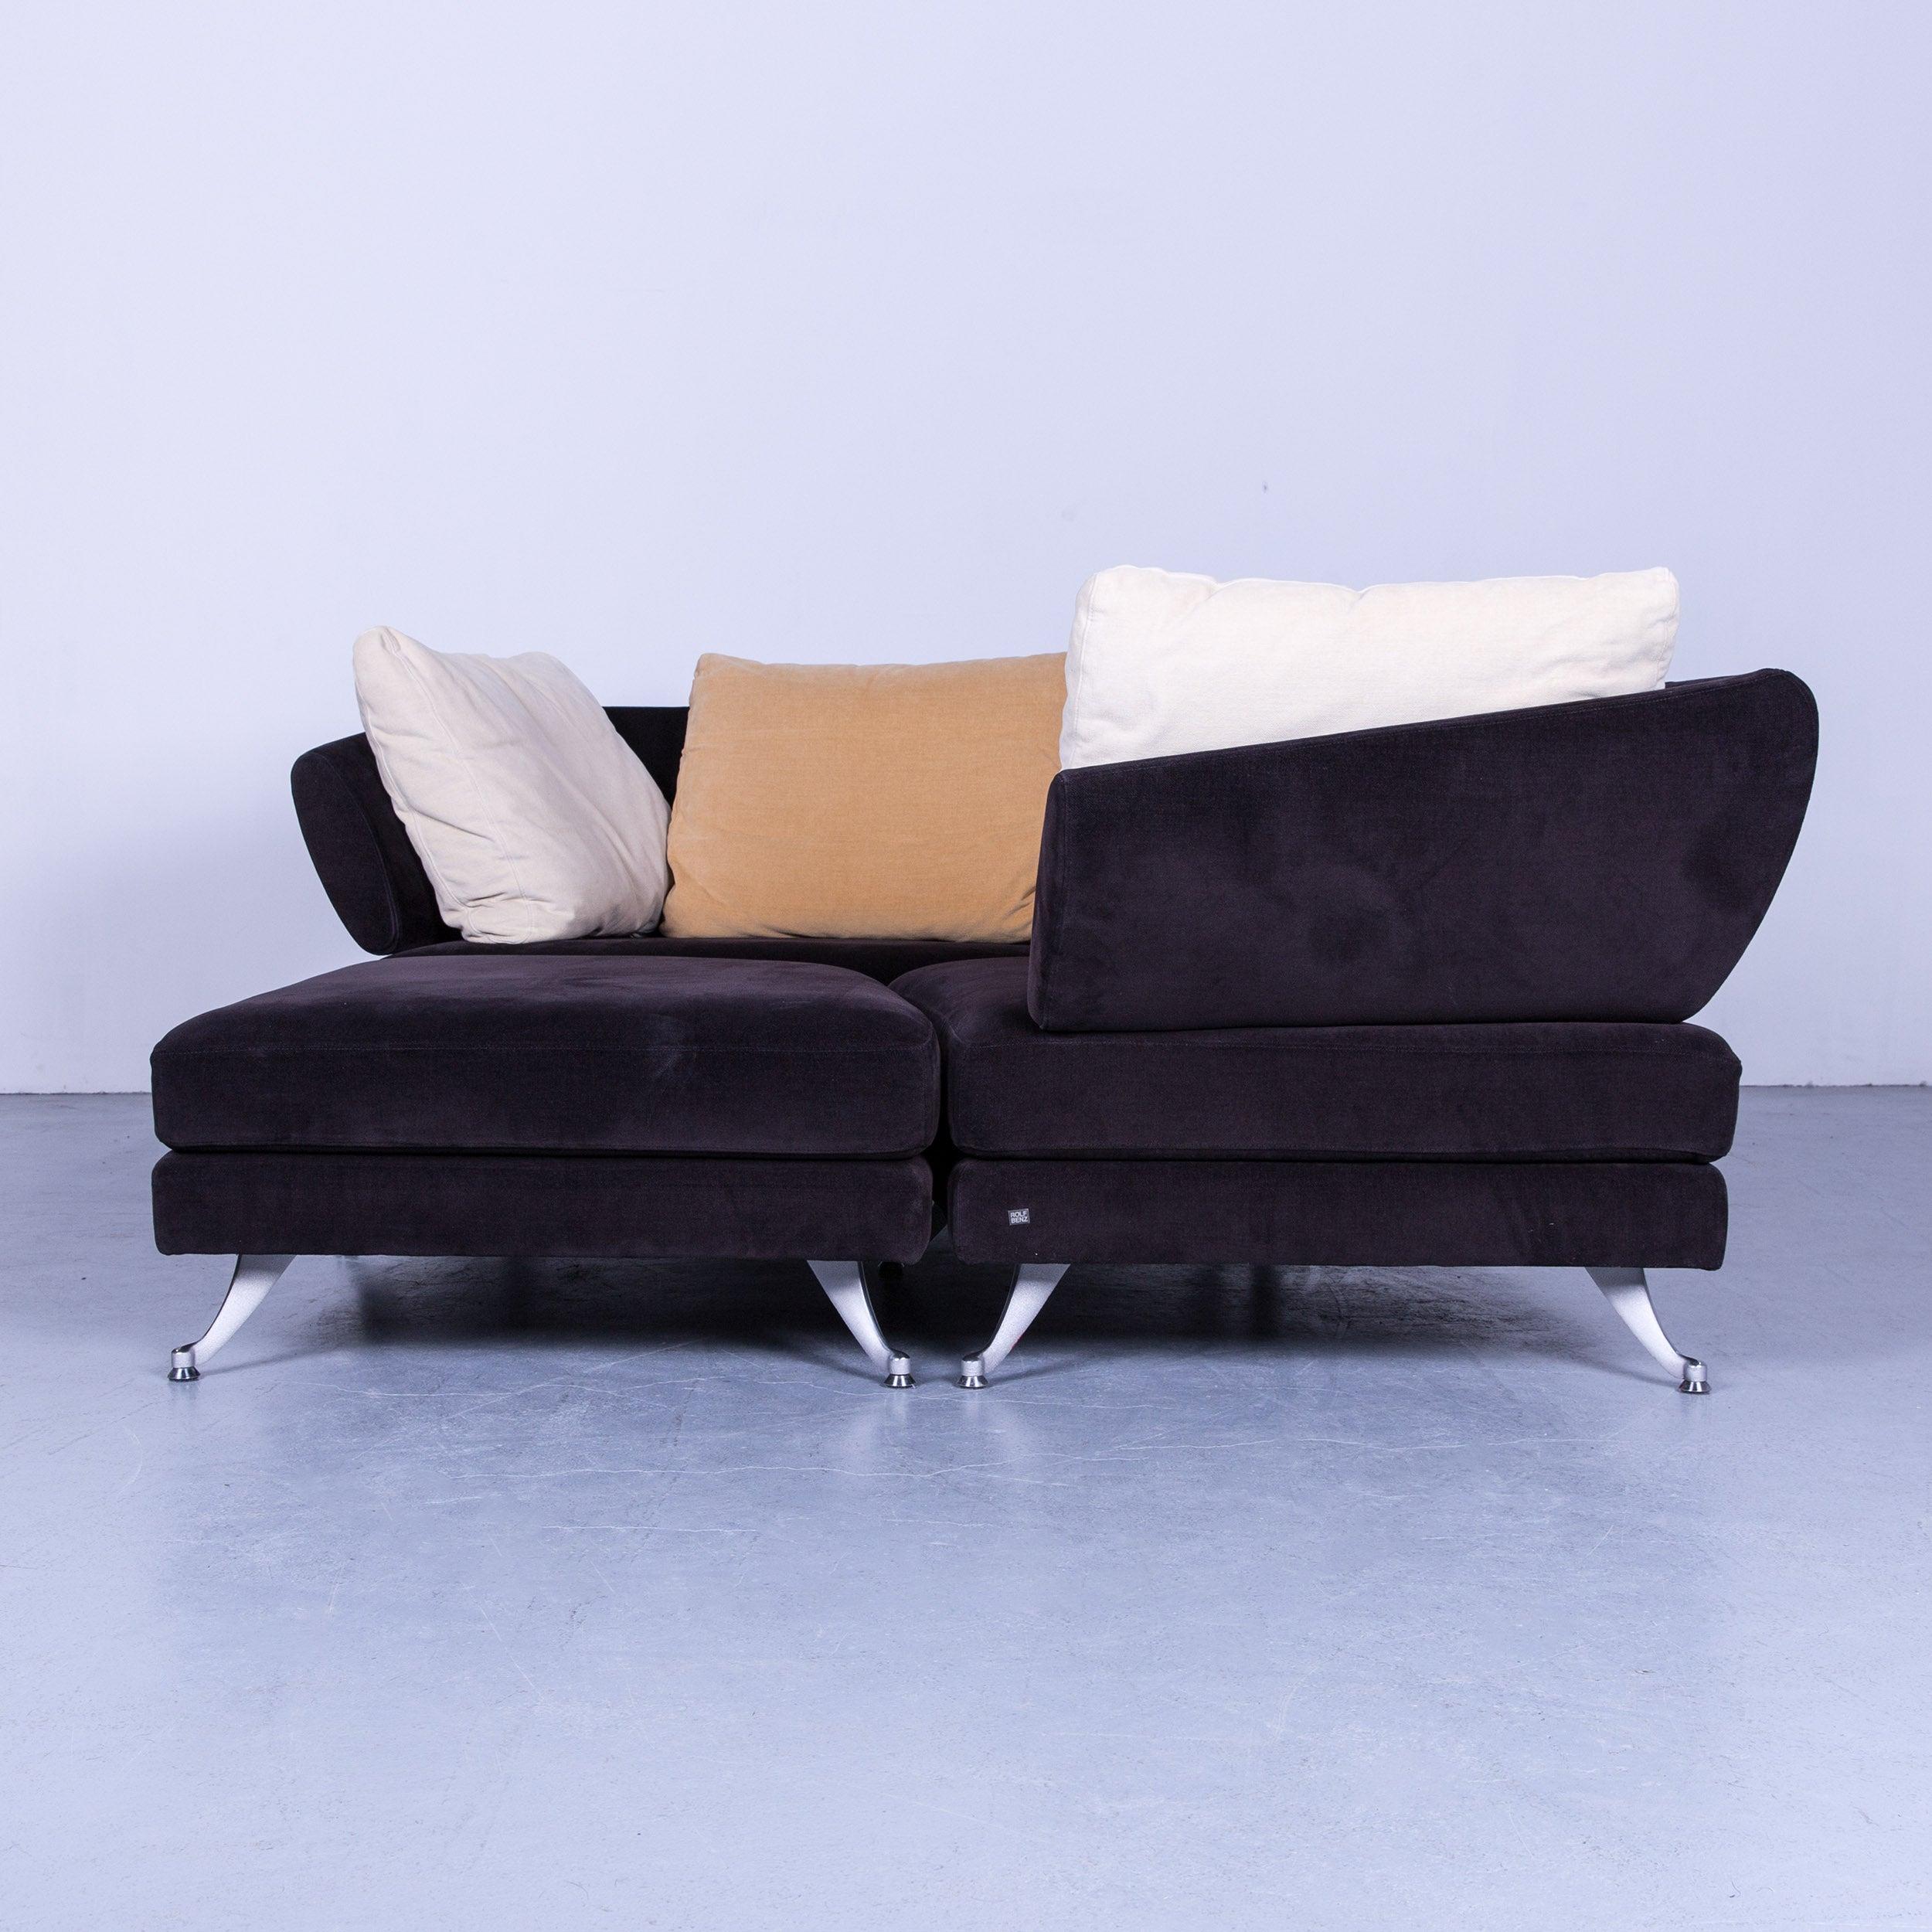 Rolf Benz 222 Designer Sofa Black Fabric Three Seat Corner Couch At